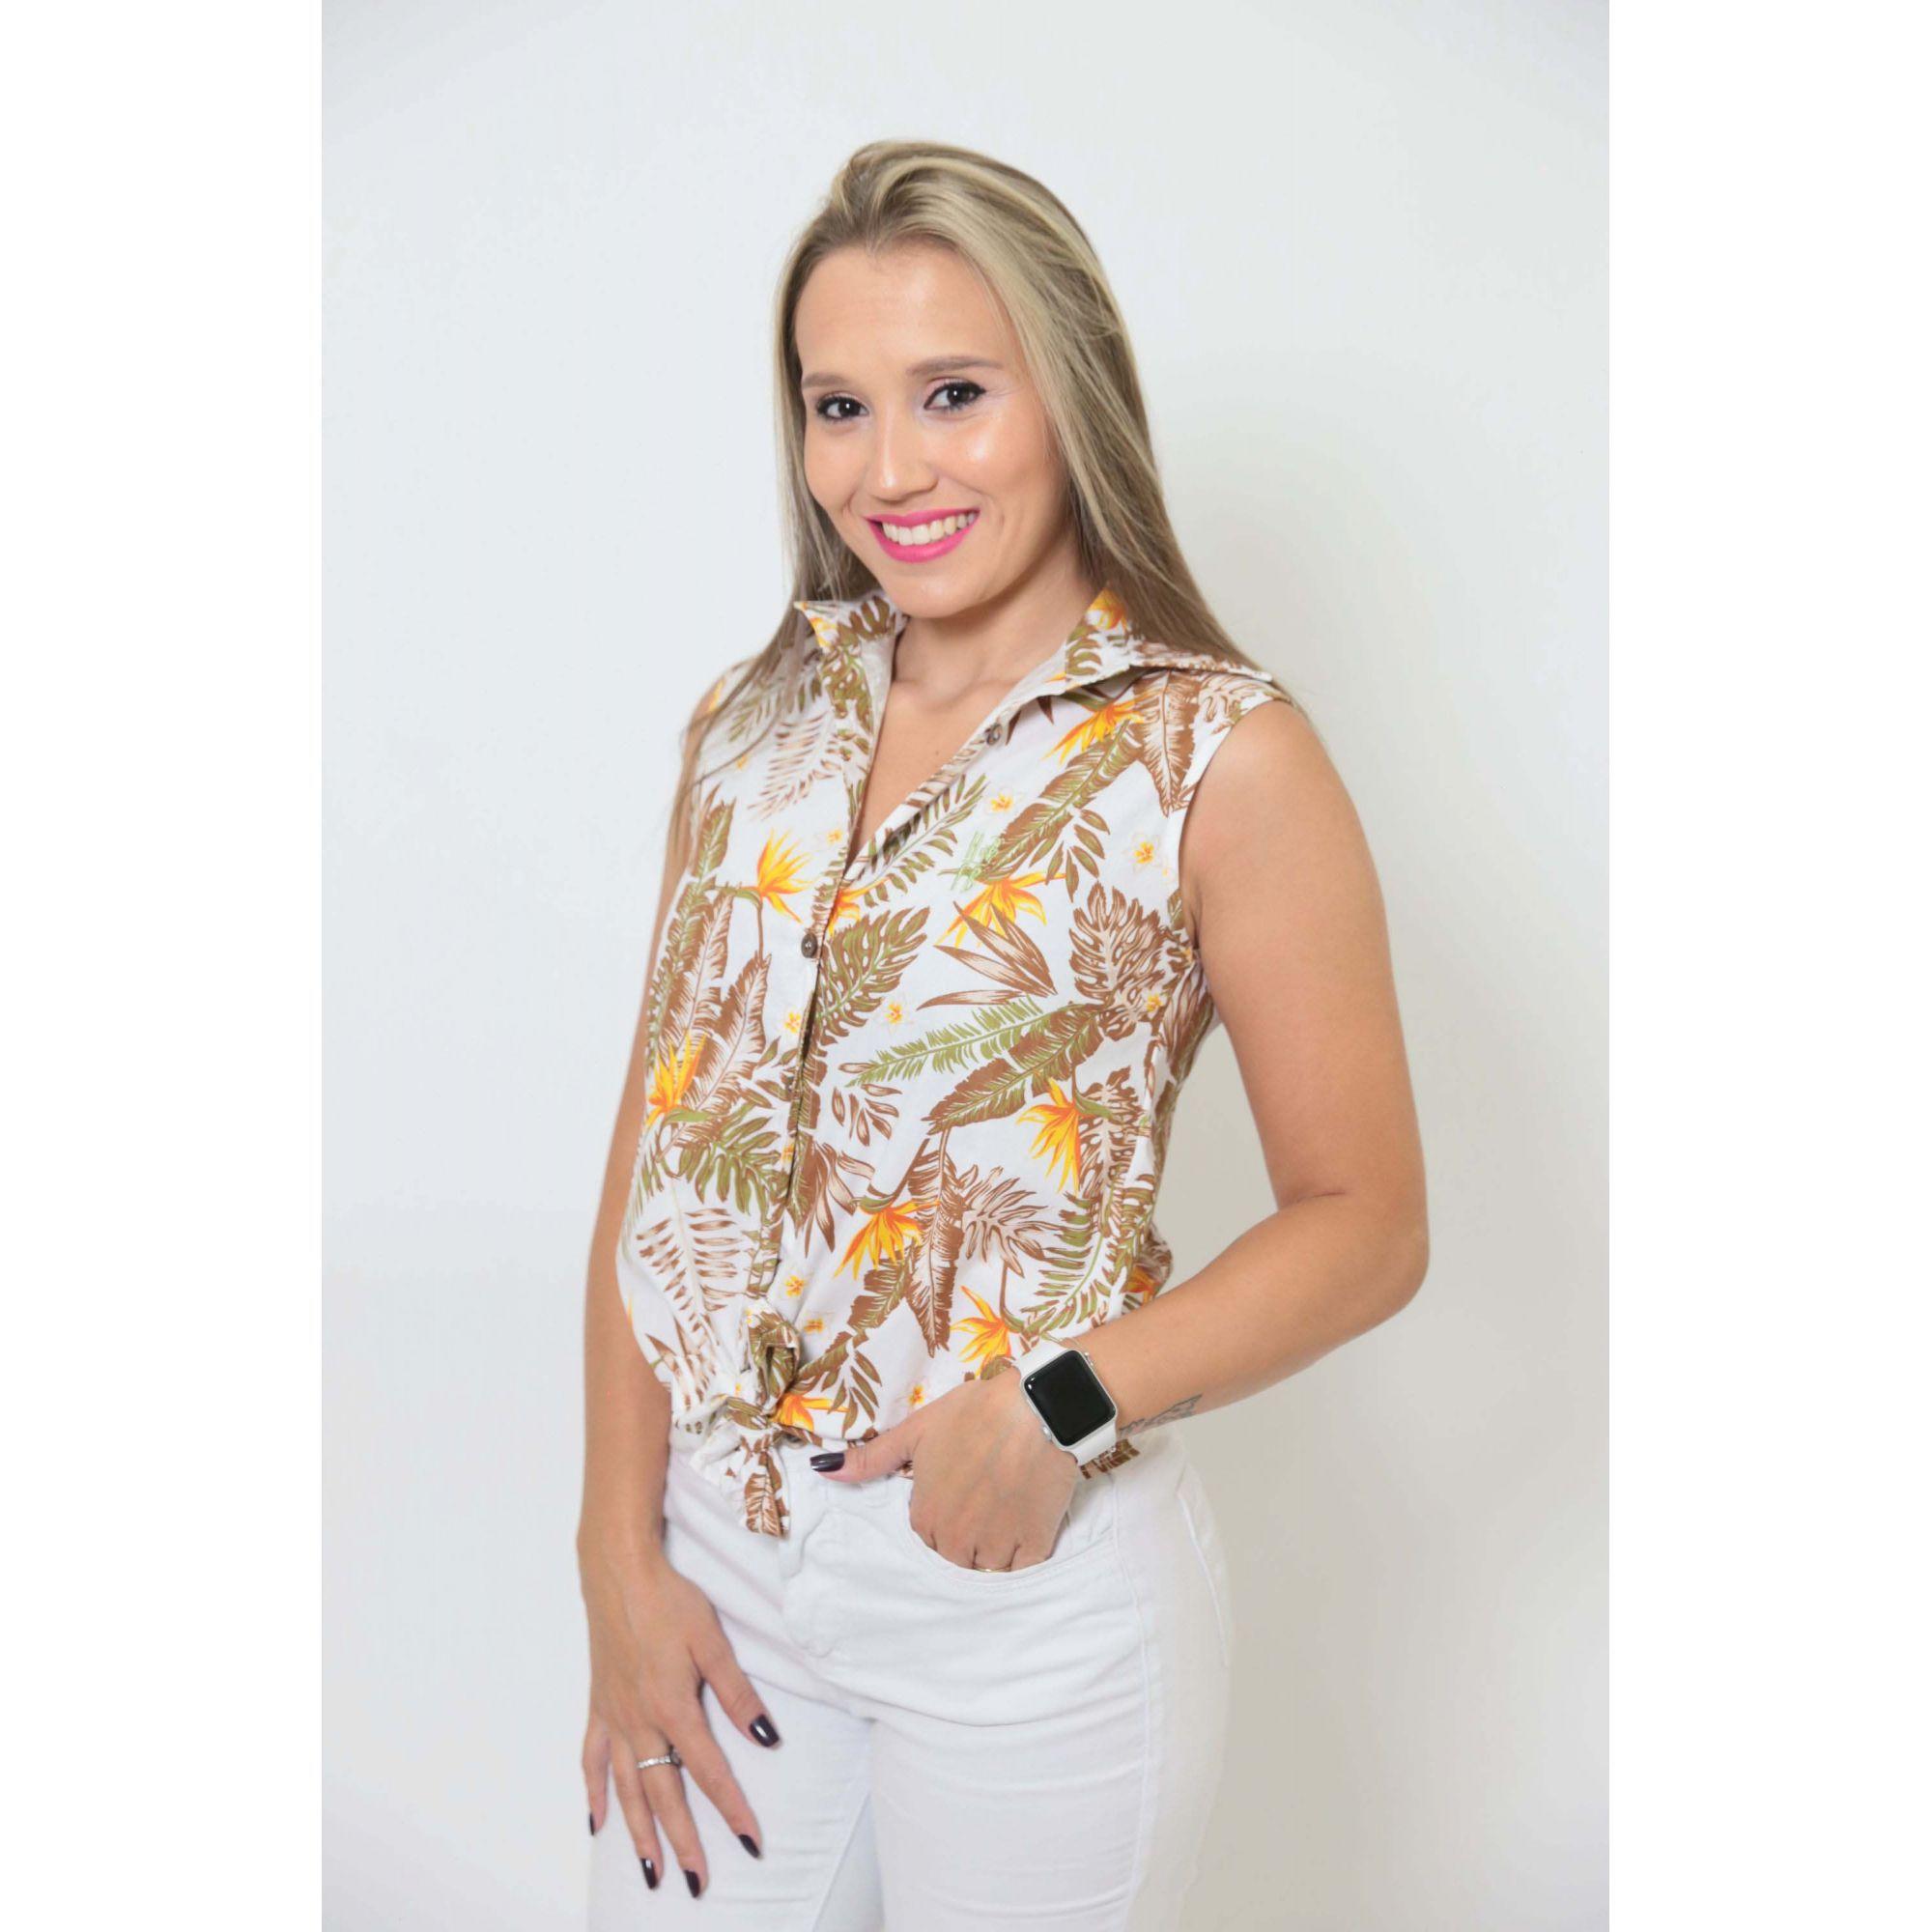 MÃE E FILHO > Kit 02 Camisas Social - Adulto e Infantil Amazonas [Coleção Tal Mãe Tal Filho]  - Heitor Fashion Brazil